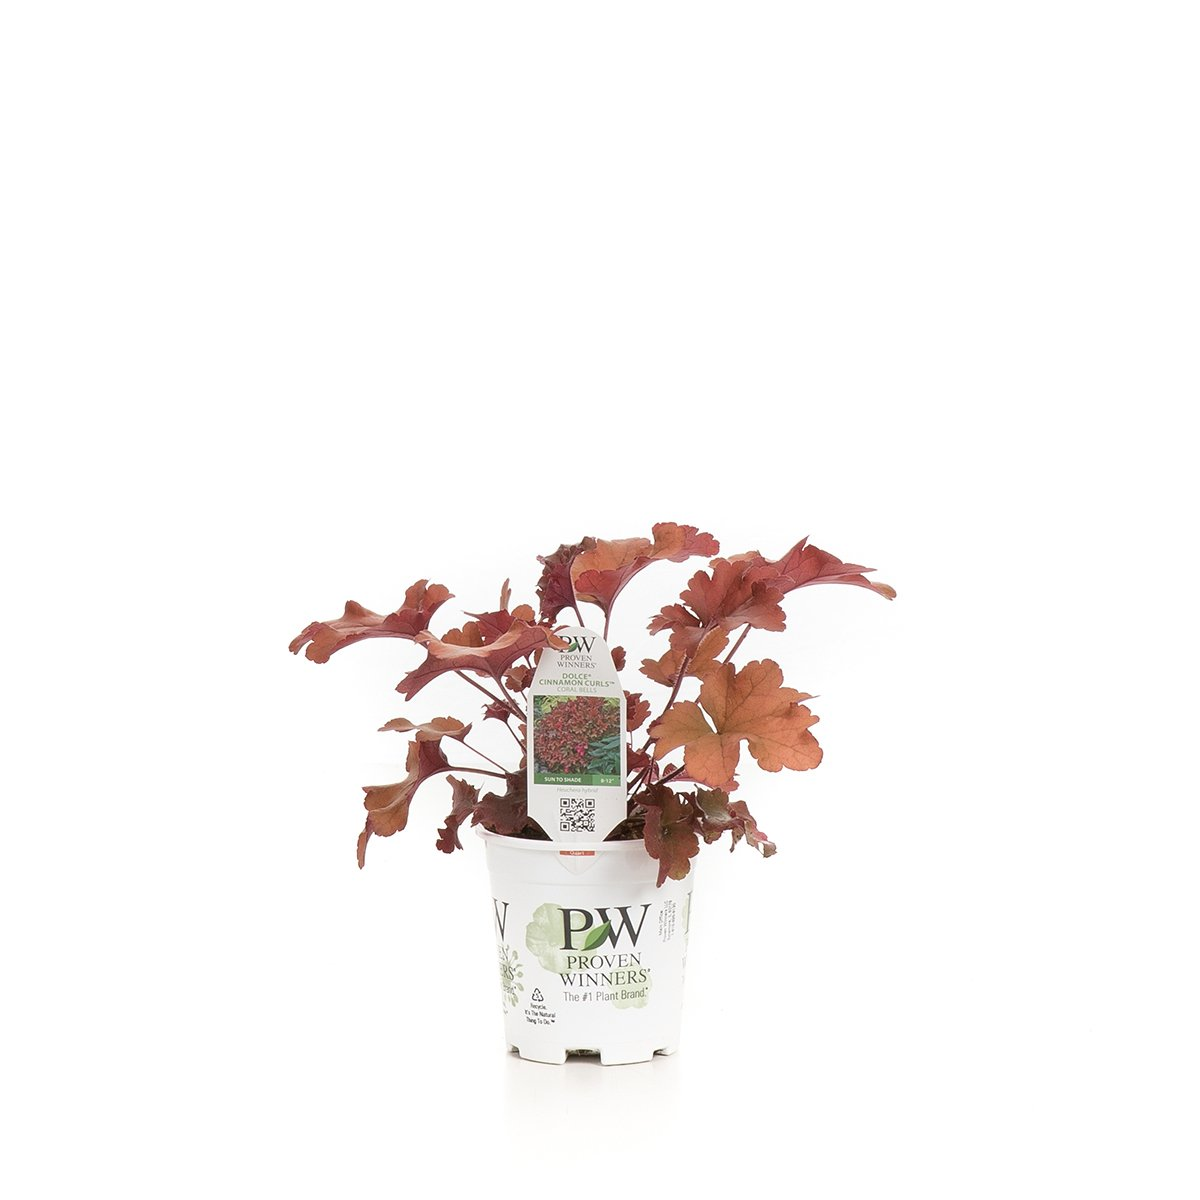 Dolce Cinnamon Curls Coral Bells (Heuchera) Live Plant, Red Foliage, 4.5 in. Quart